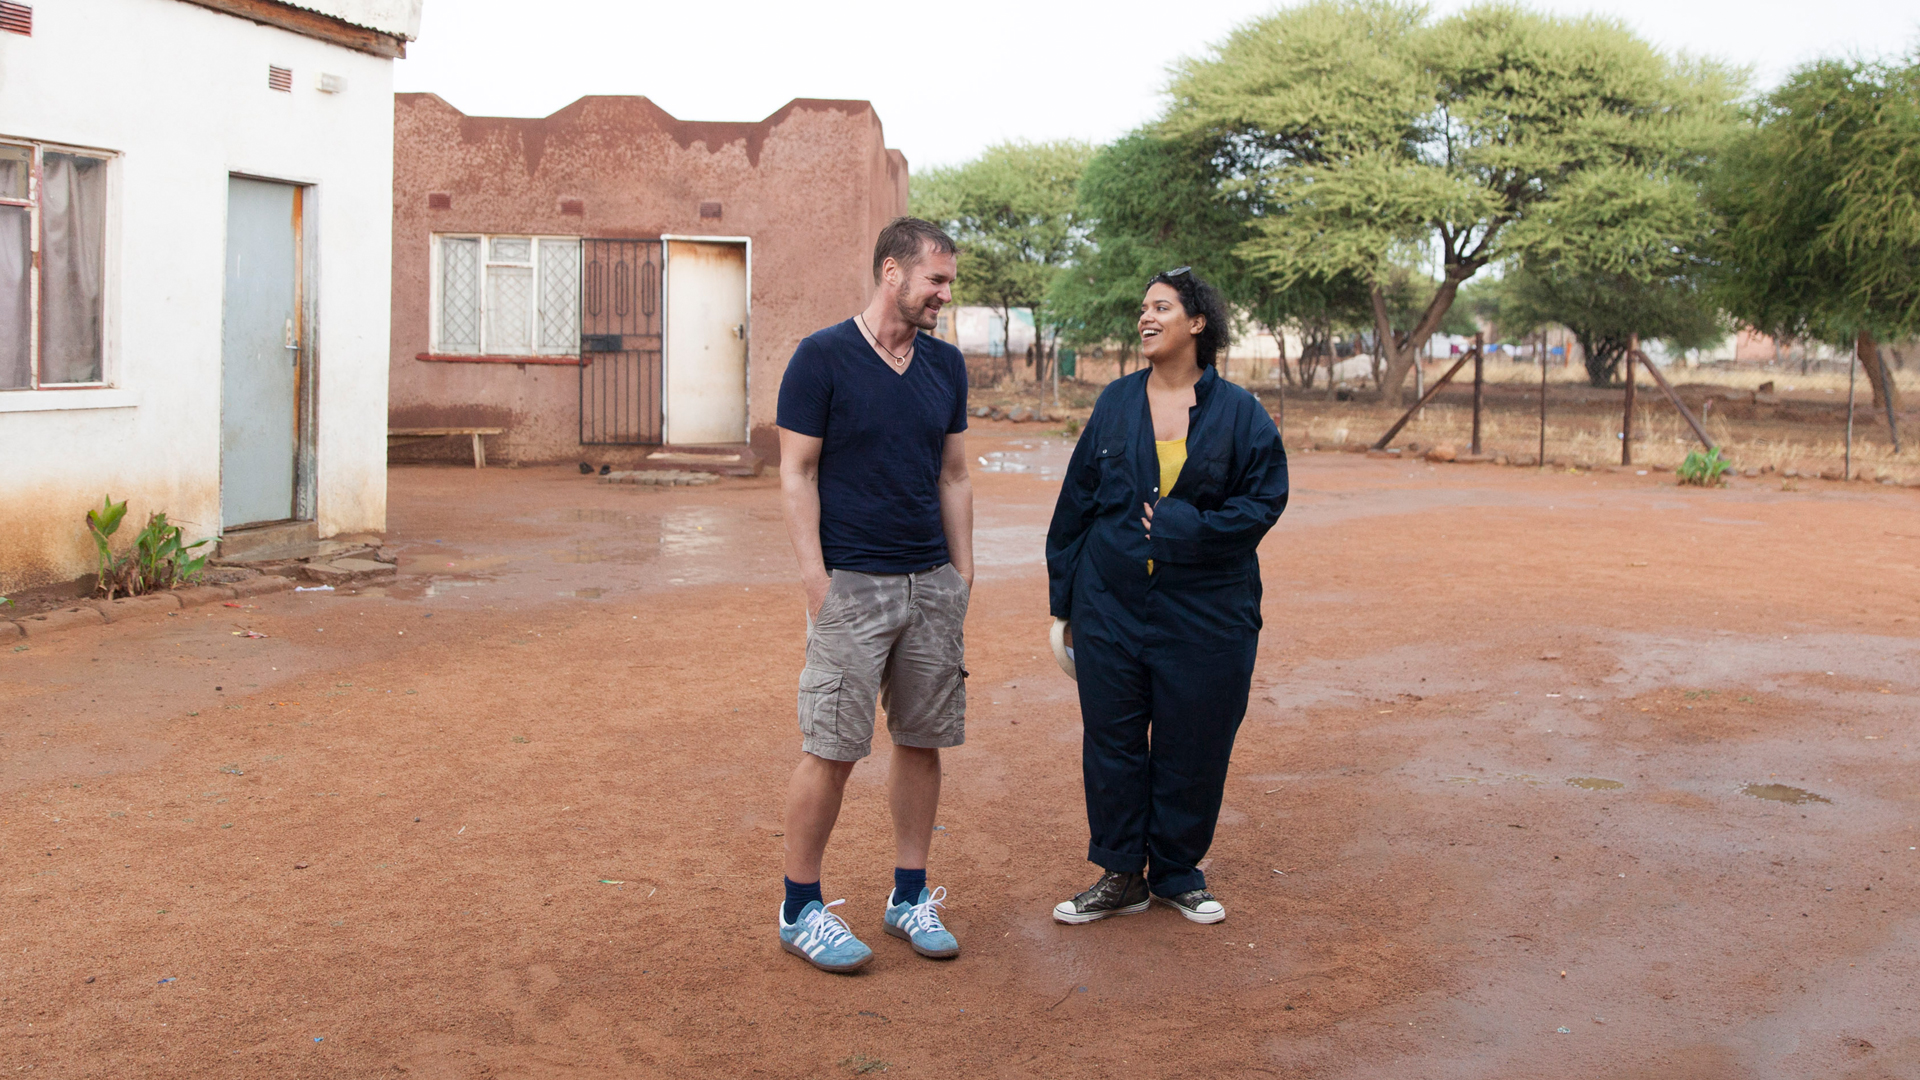 Arte Documentary - Queens of Botswana - Making of Image 3